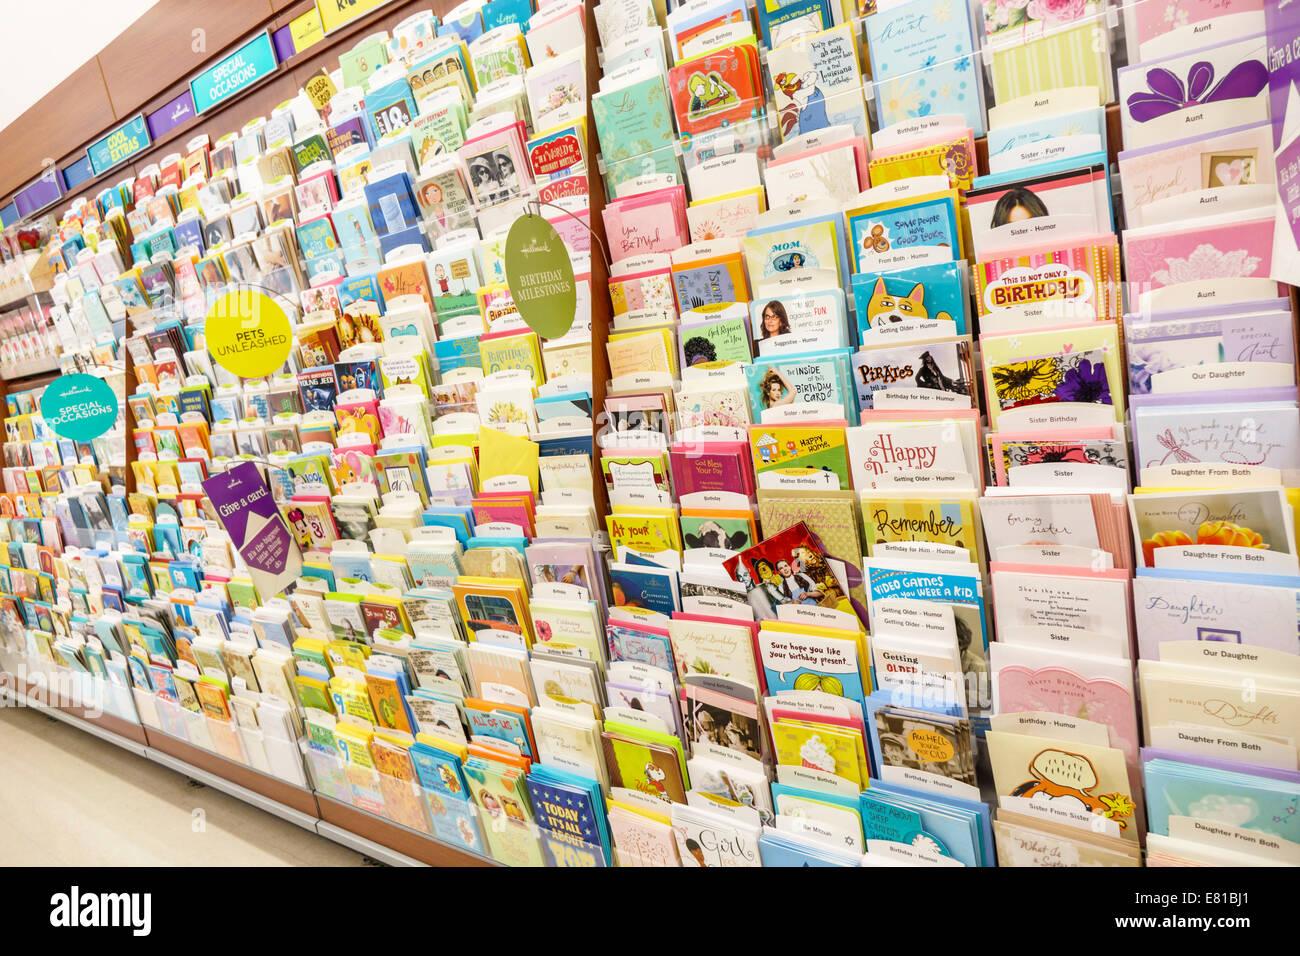 Miami beach florida walgreens greeting cards sale display organized miami beach florida walgreens greeting cards sale display organized birthday m4hsunfo